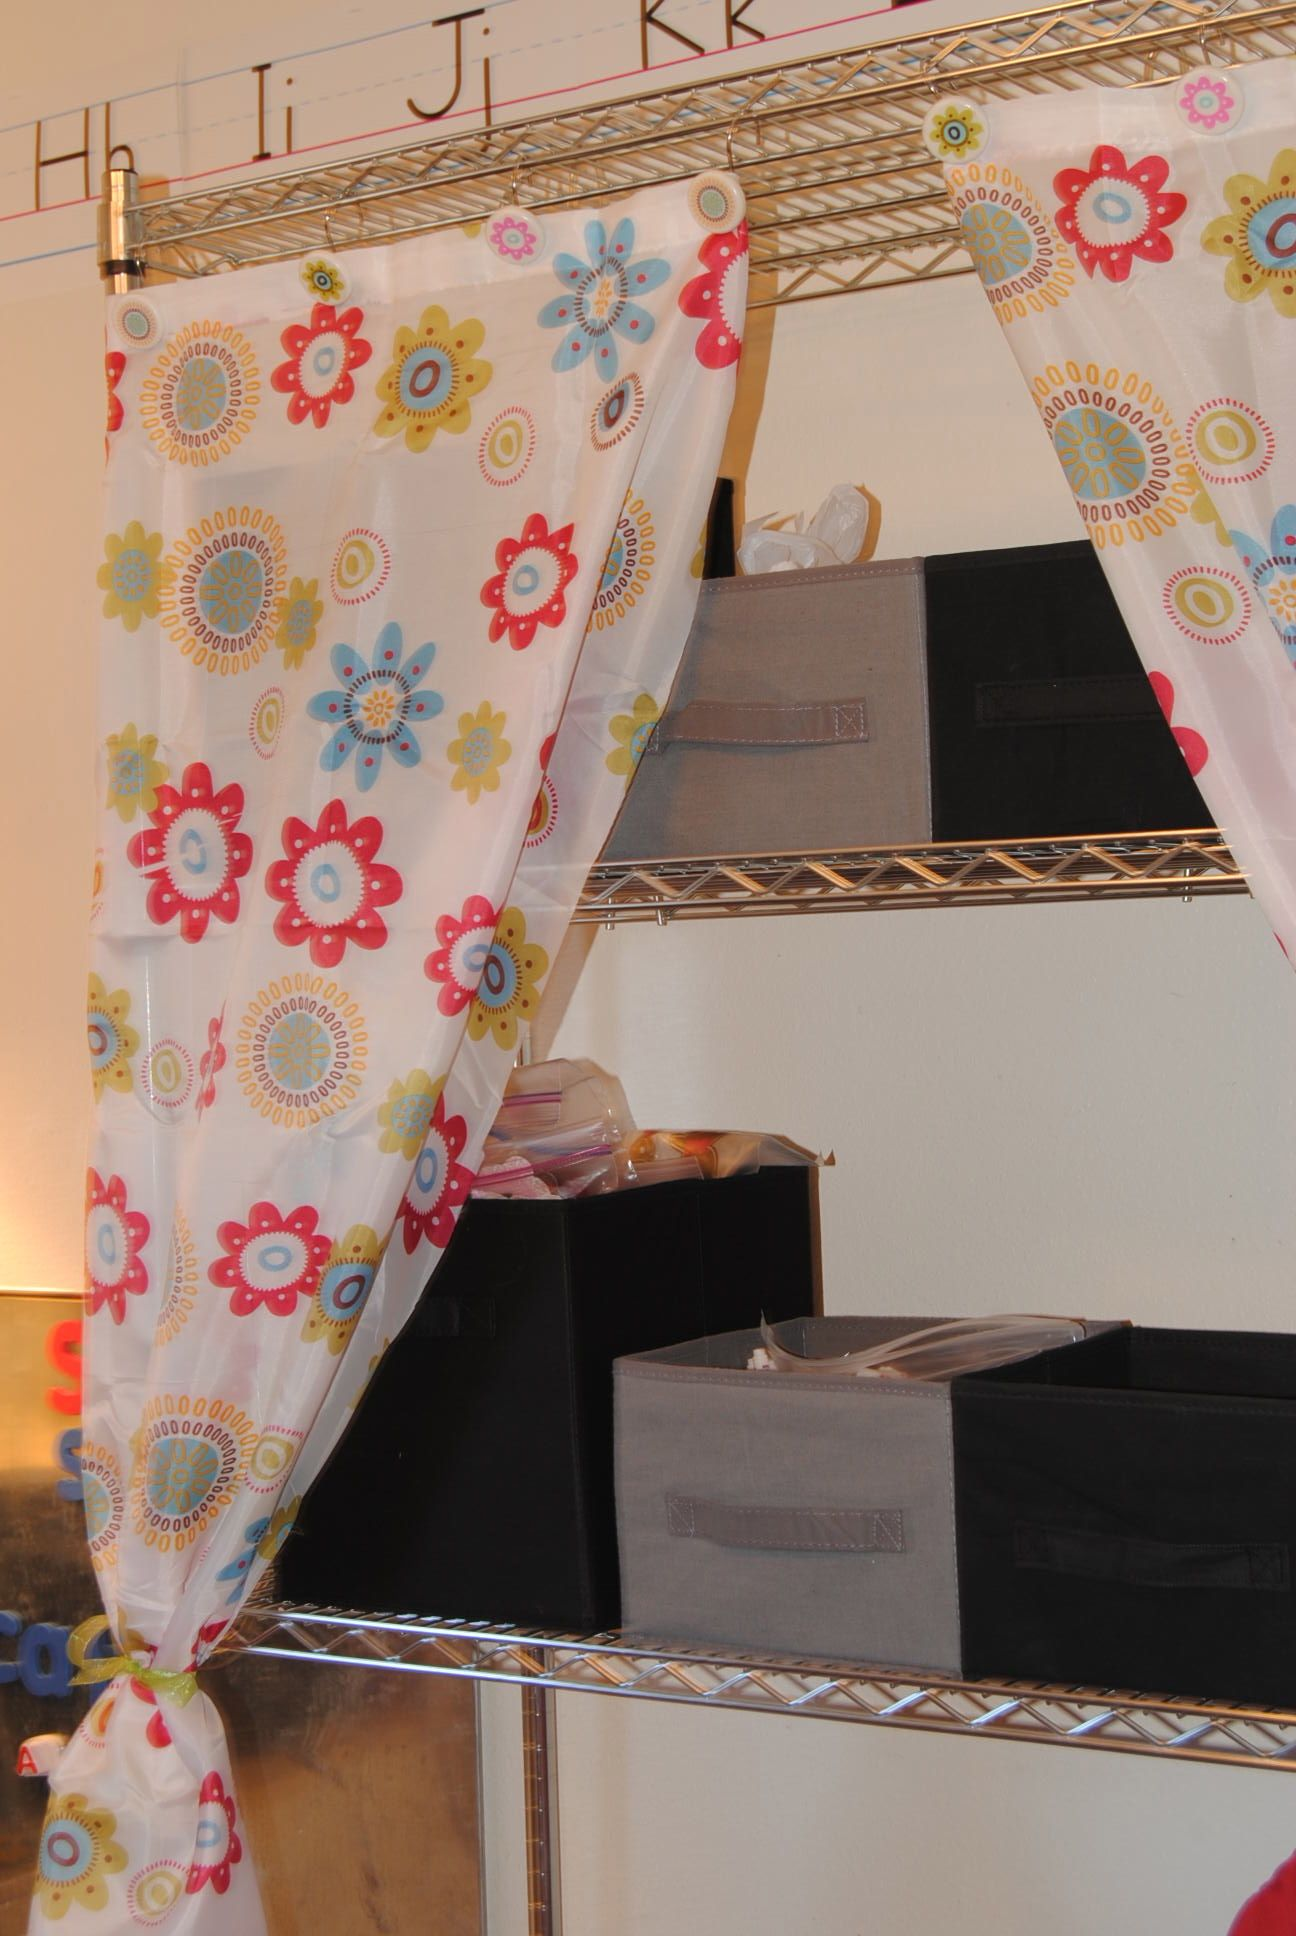 25 Kool Aid Projects Sewing Room Furniture Basement Inspiration